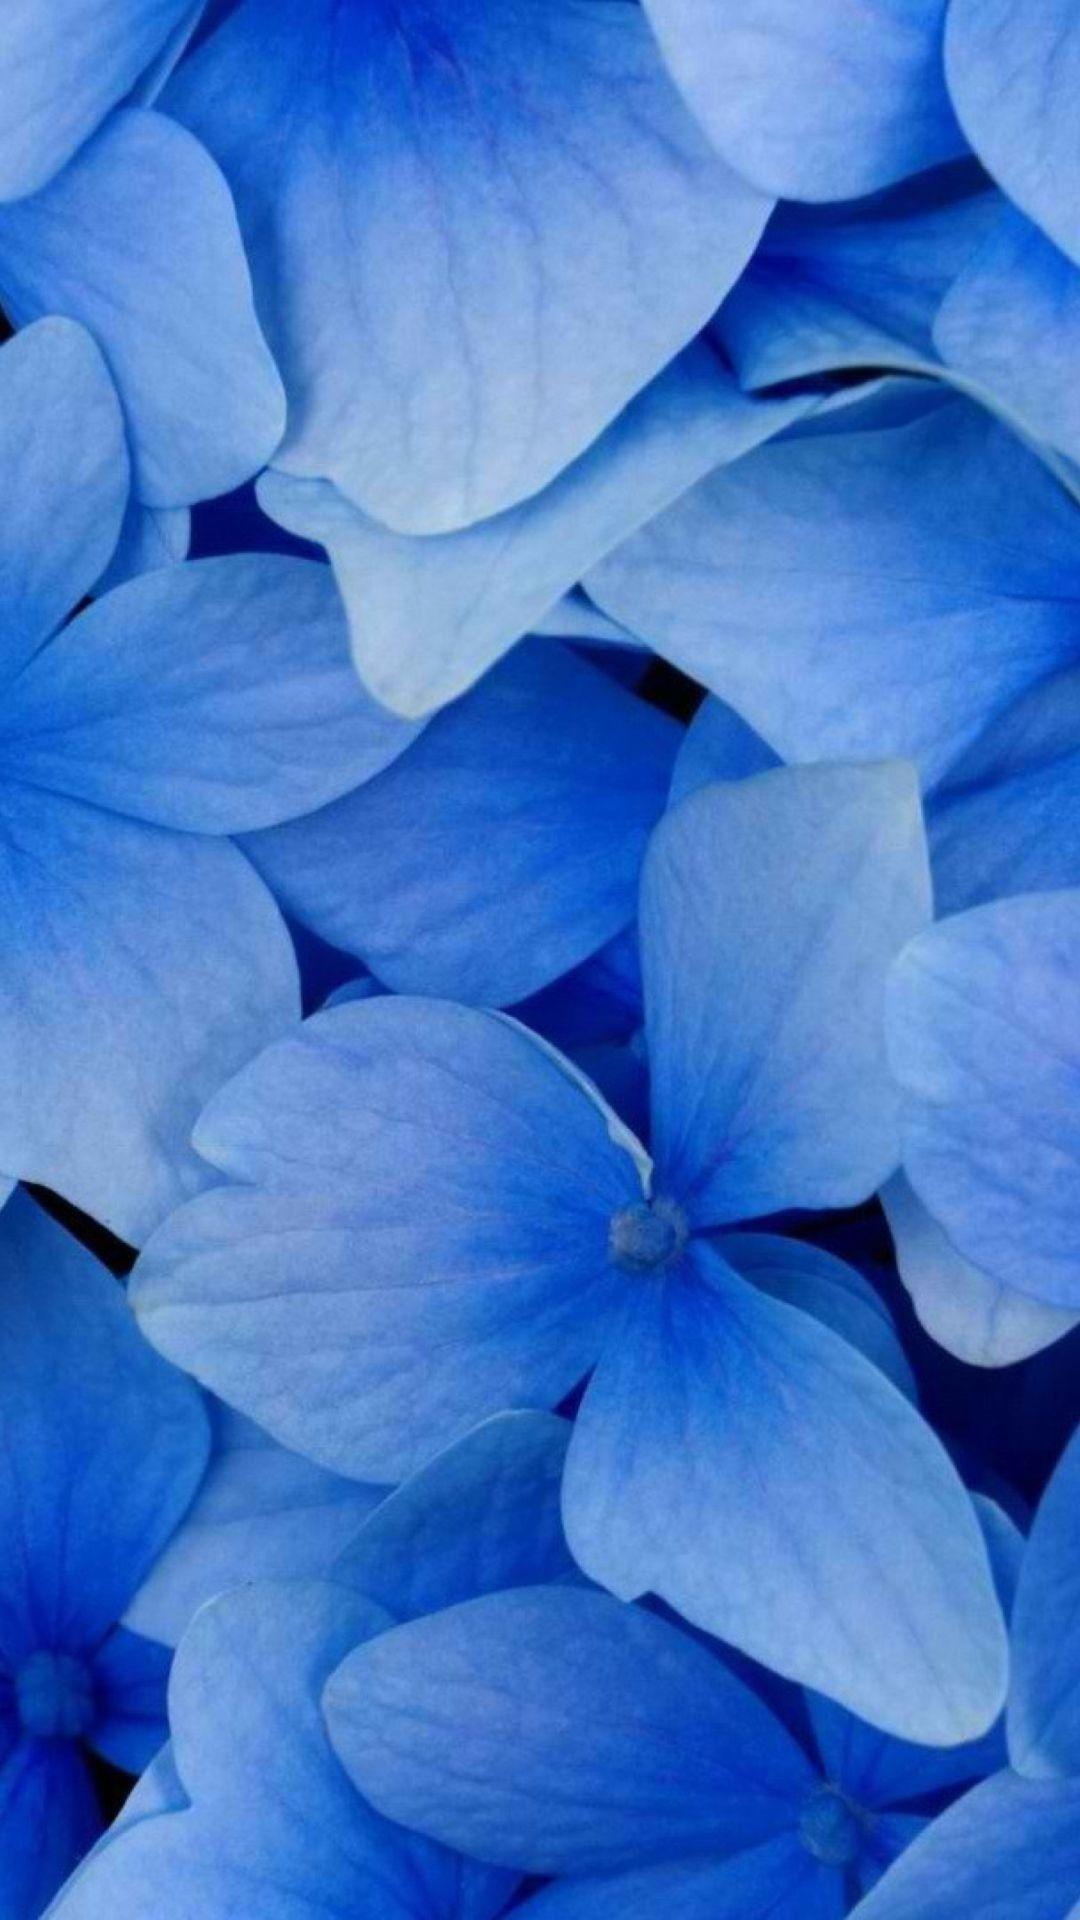 Blue Flowers Vertically